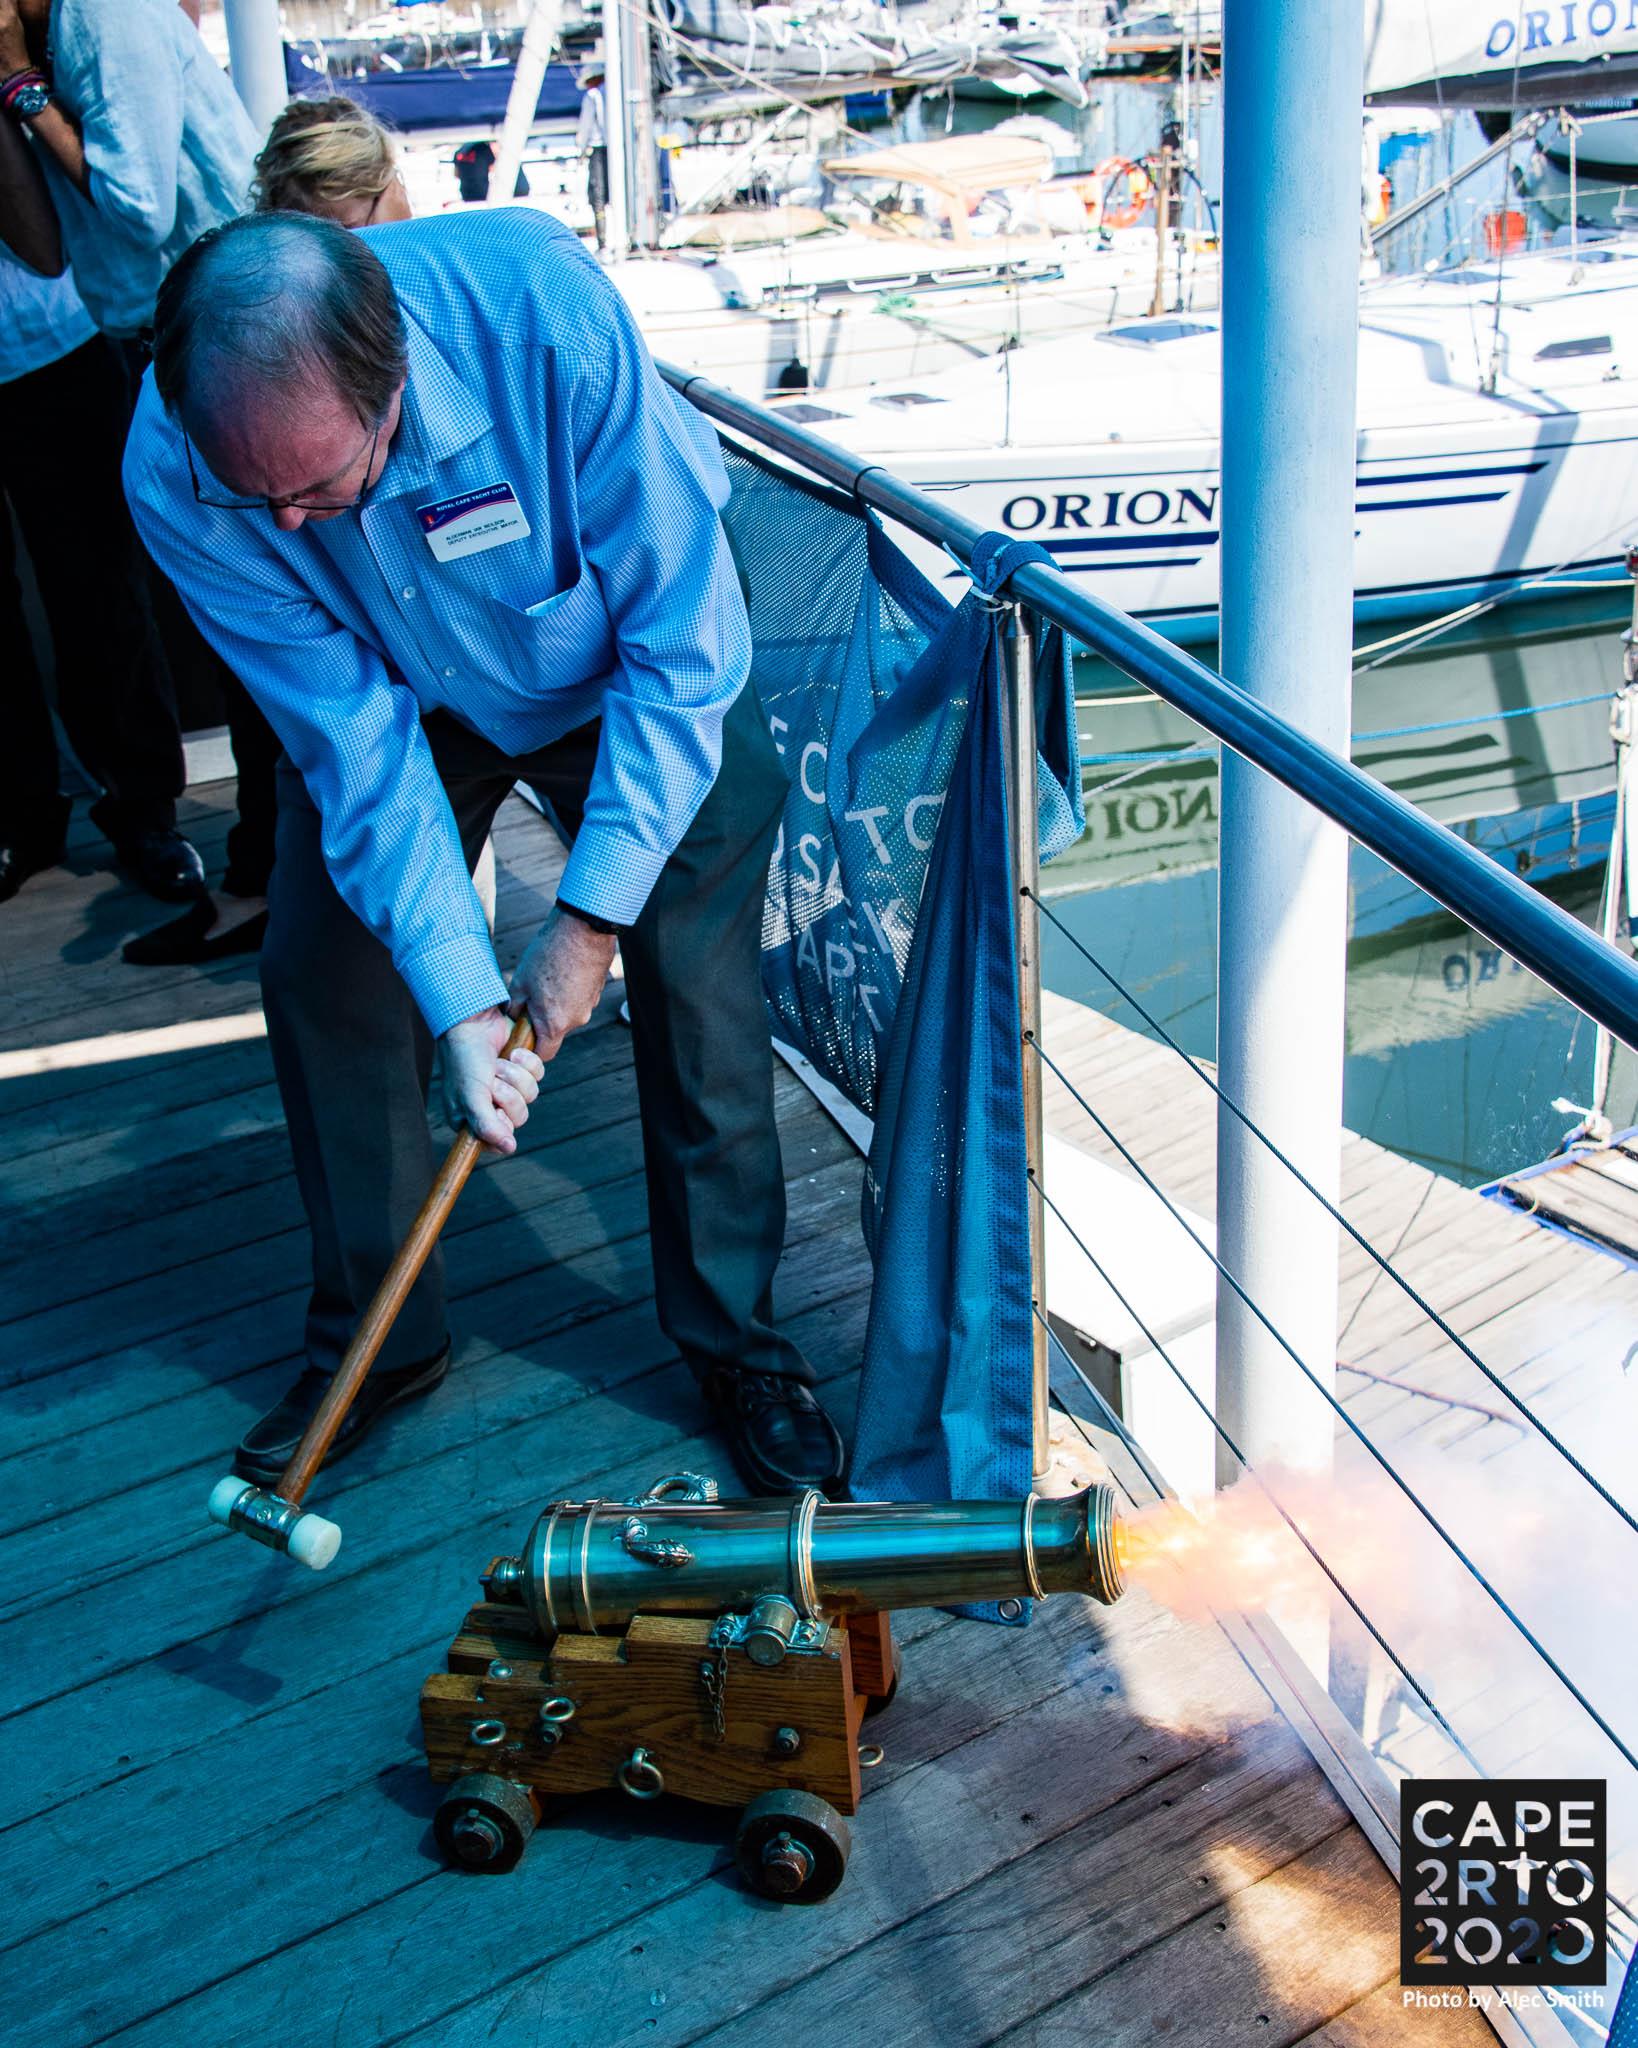 Cape2Rio 2020 yacht race starter's cannon